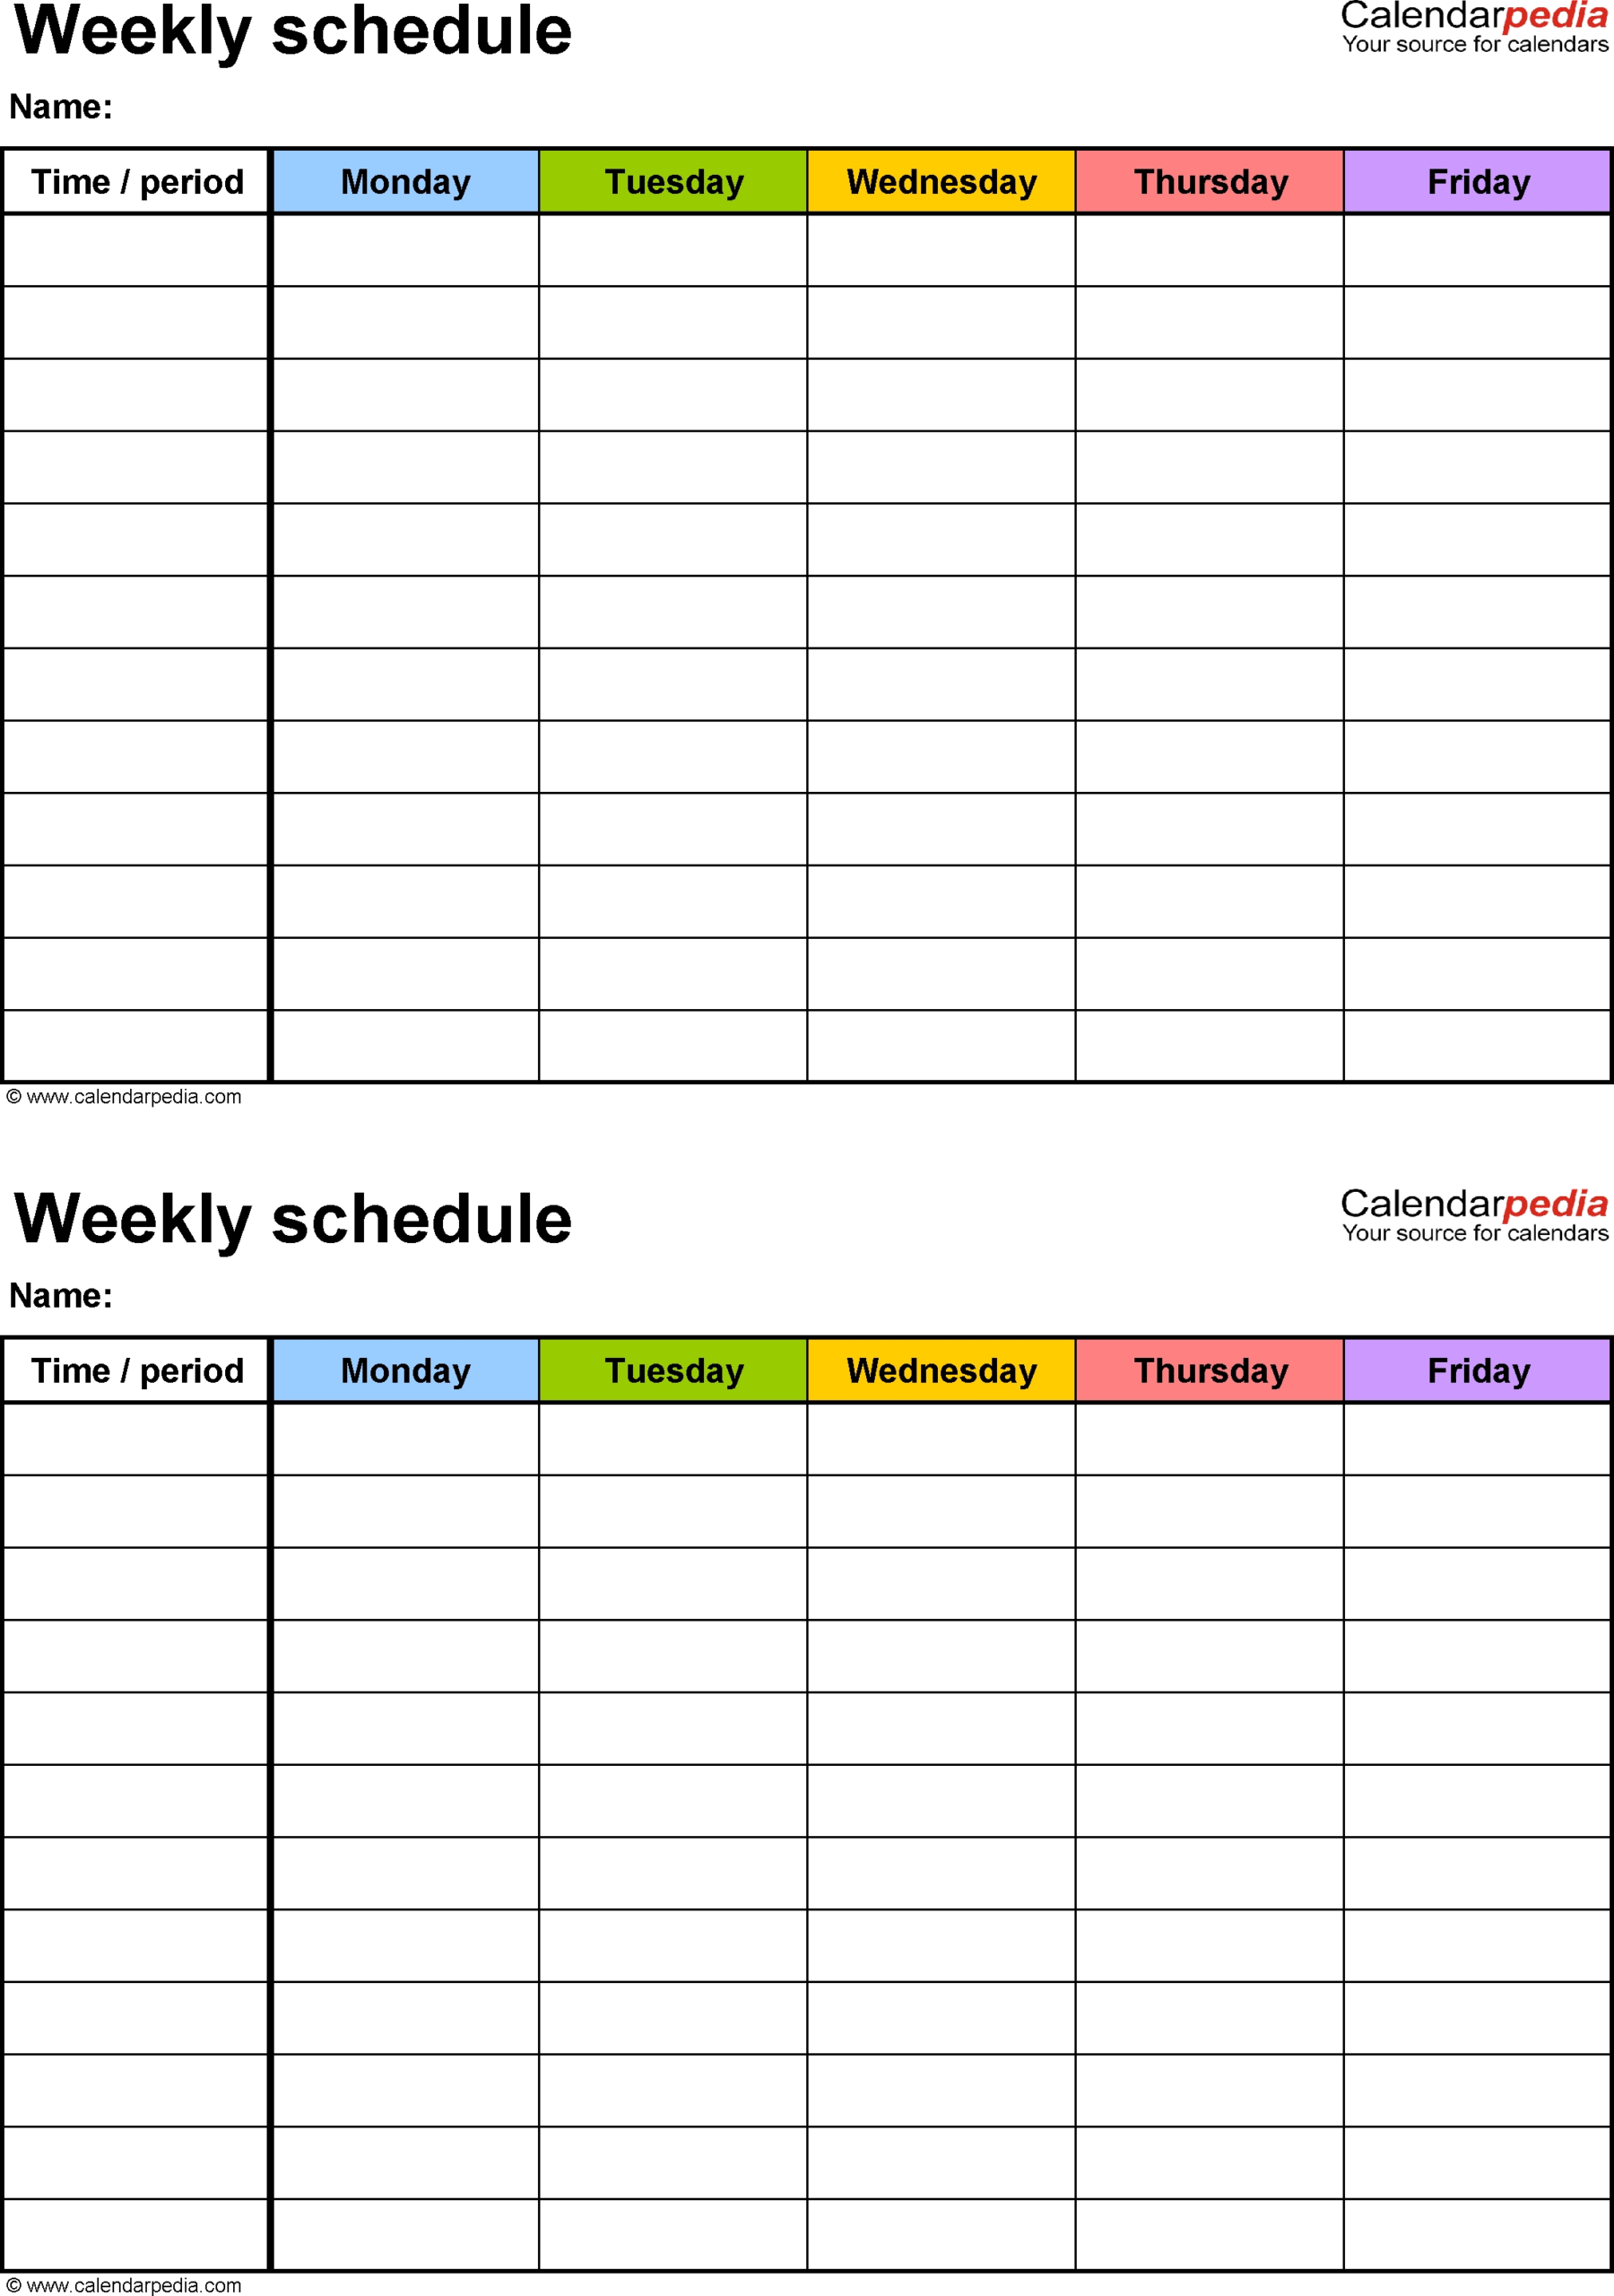 Monday To Friday Monthly Calendar Template | Calendar